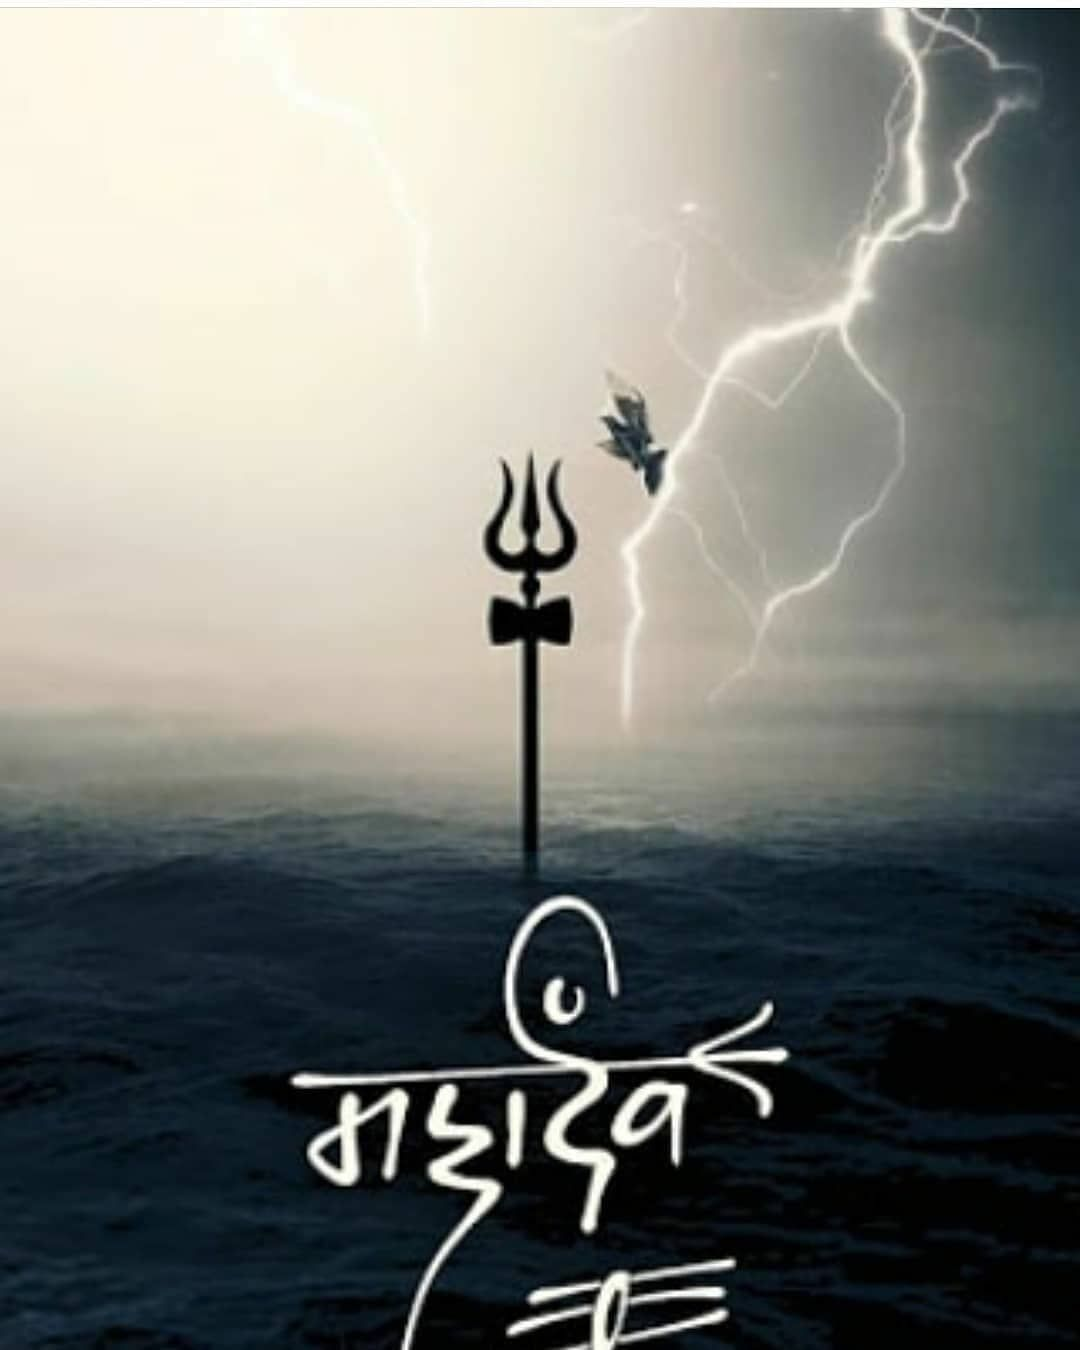 3d Hd Mahakal Wallpaper Background Images Hd Shiva Lord Wallpapers Om Namah Shivaya